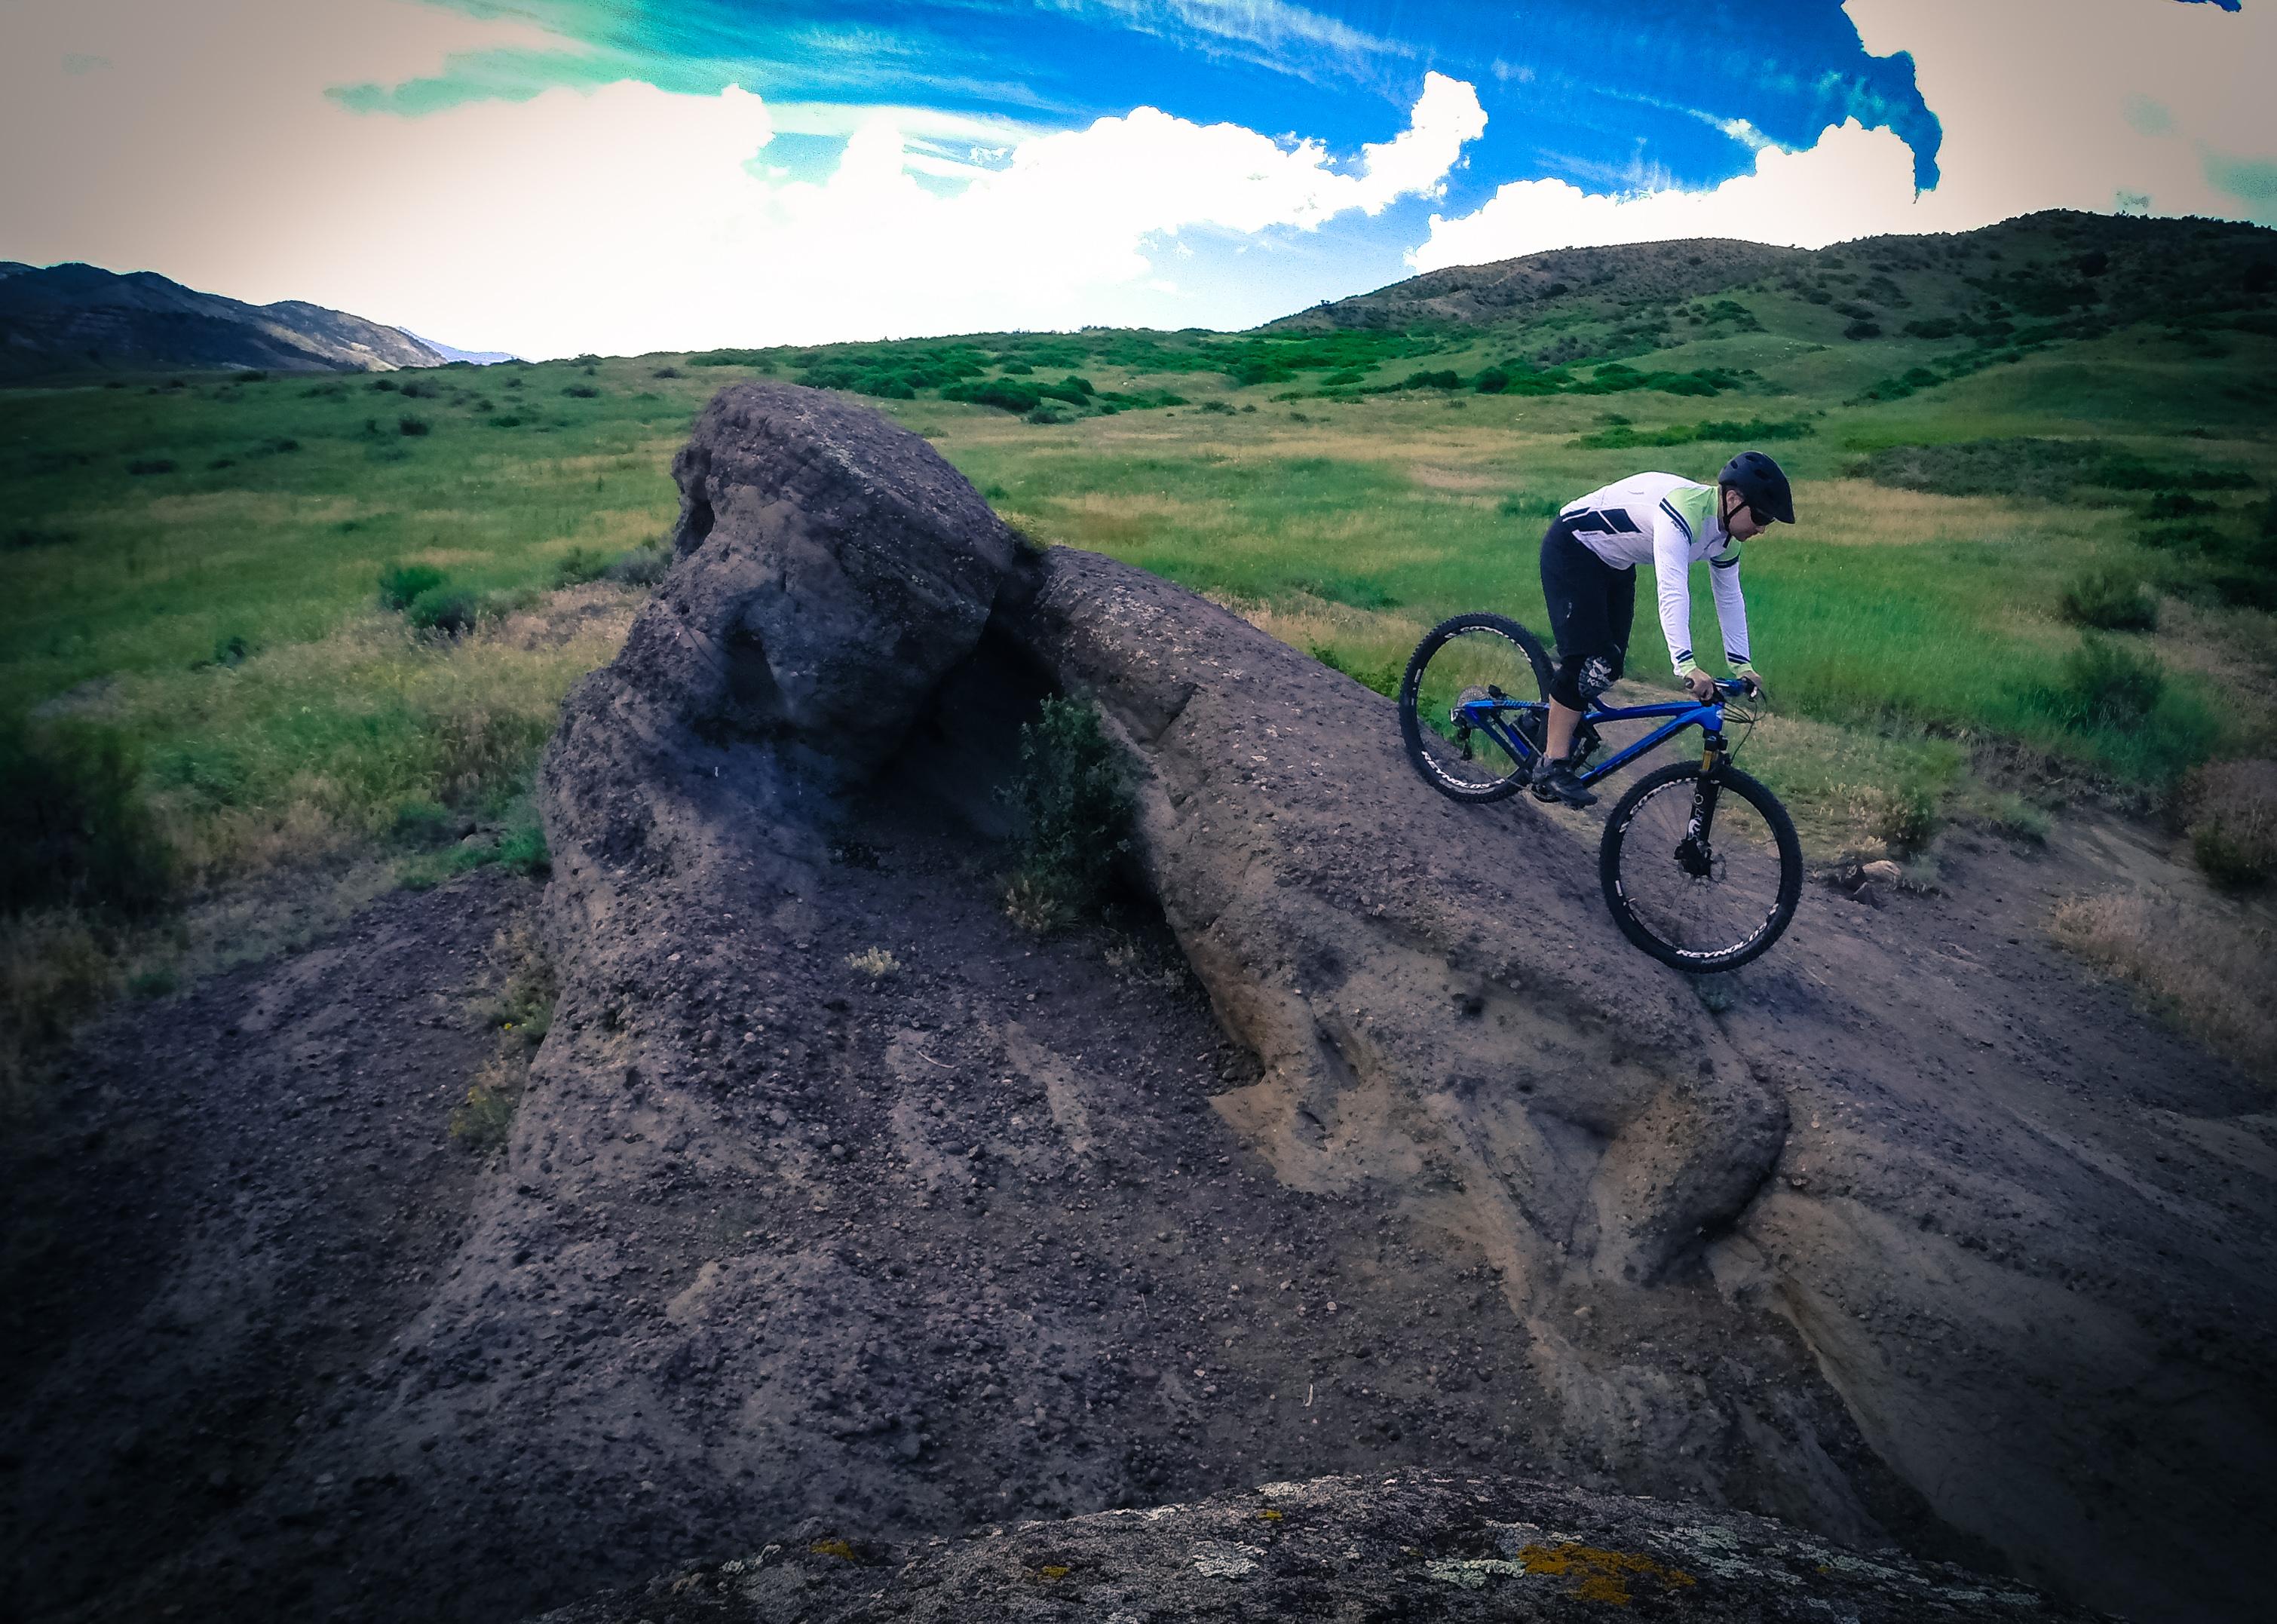 f513099d0 G0809992 - Singletracks Mountain Bike News